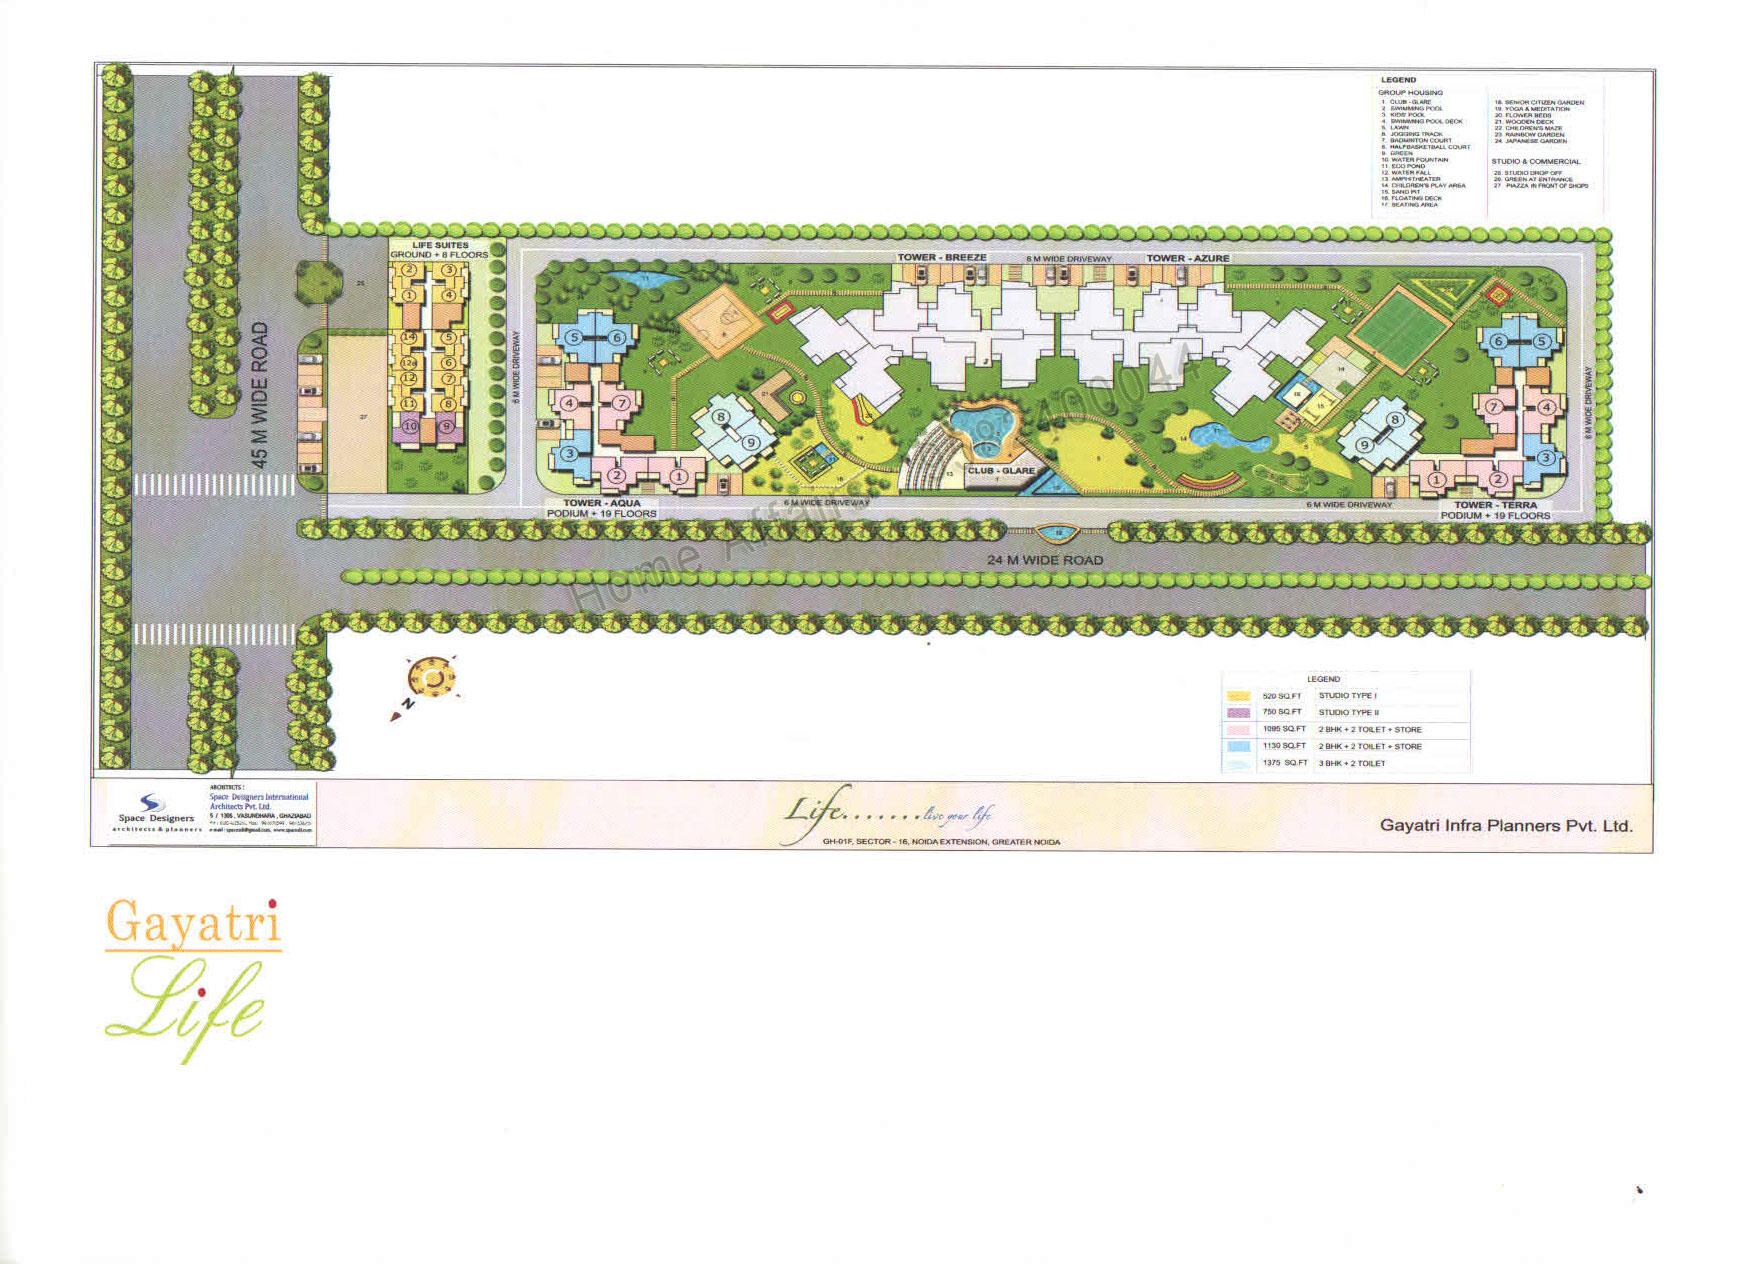 gayatri life site plan